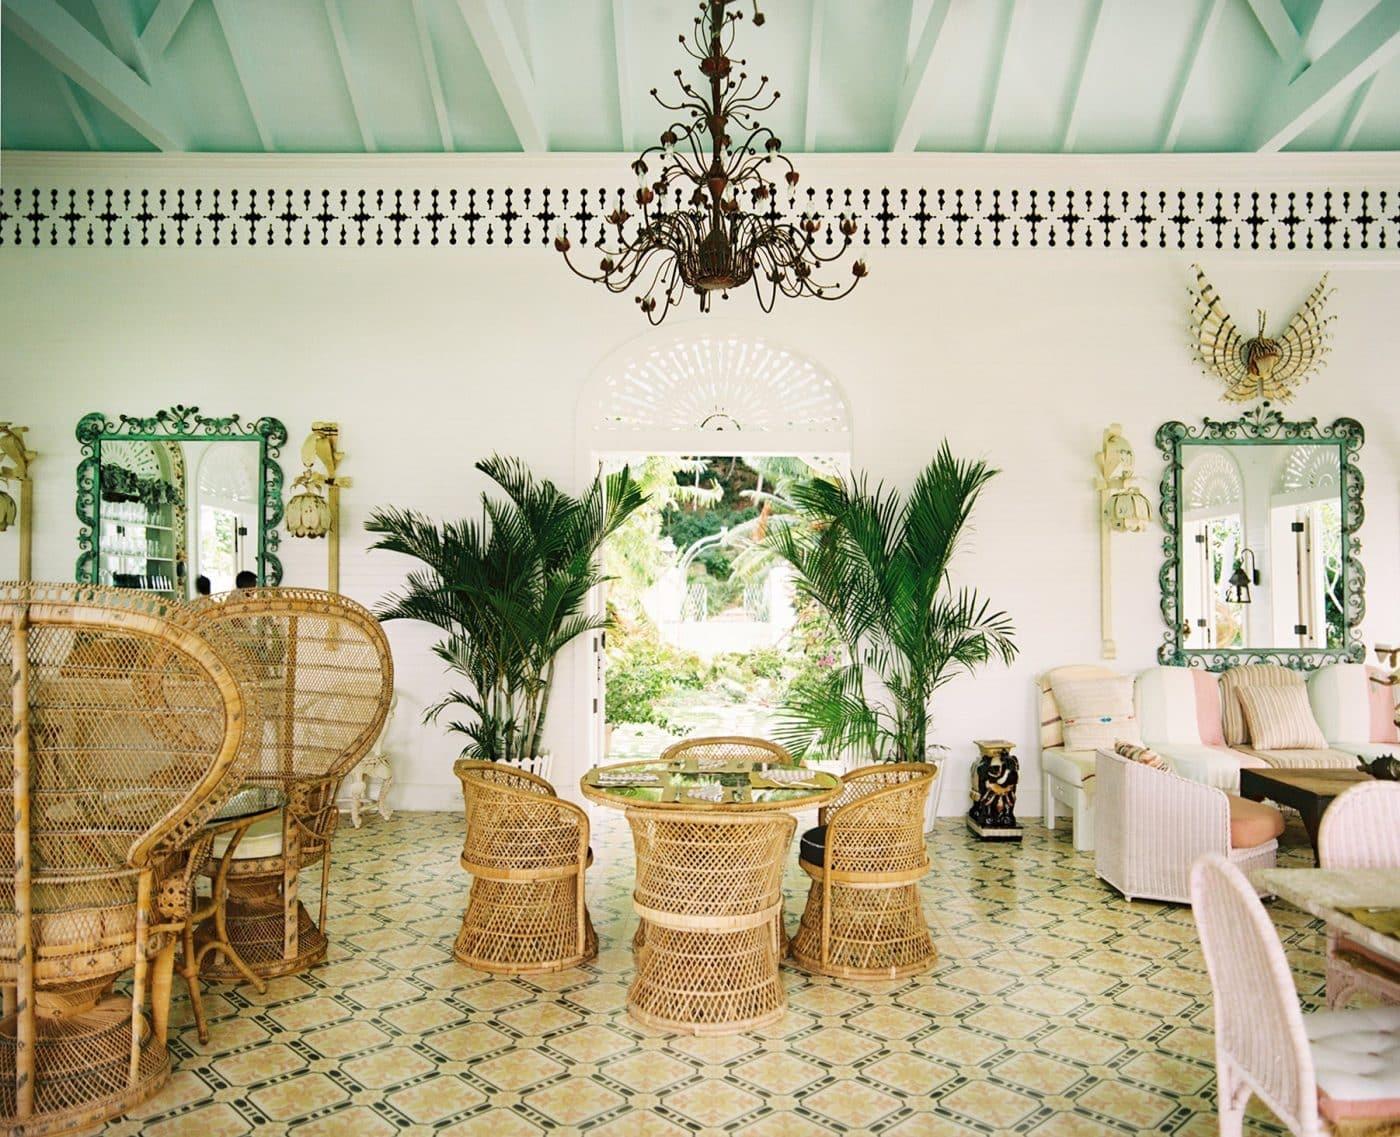 Playa Grande Beach Club lobby in the Dominican Republic, desiged by Celerie Kemble